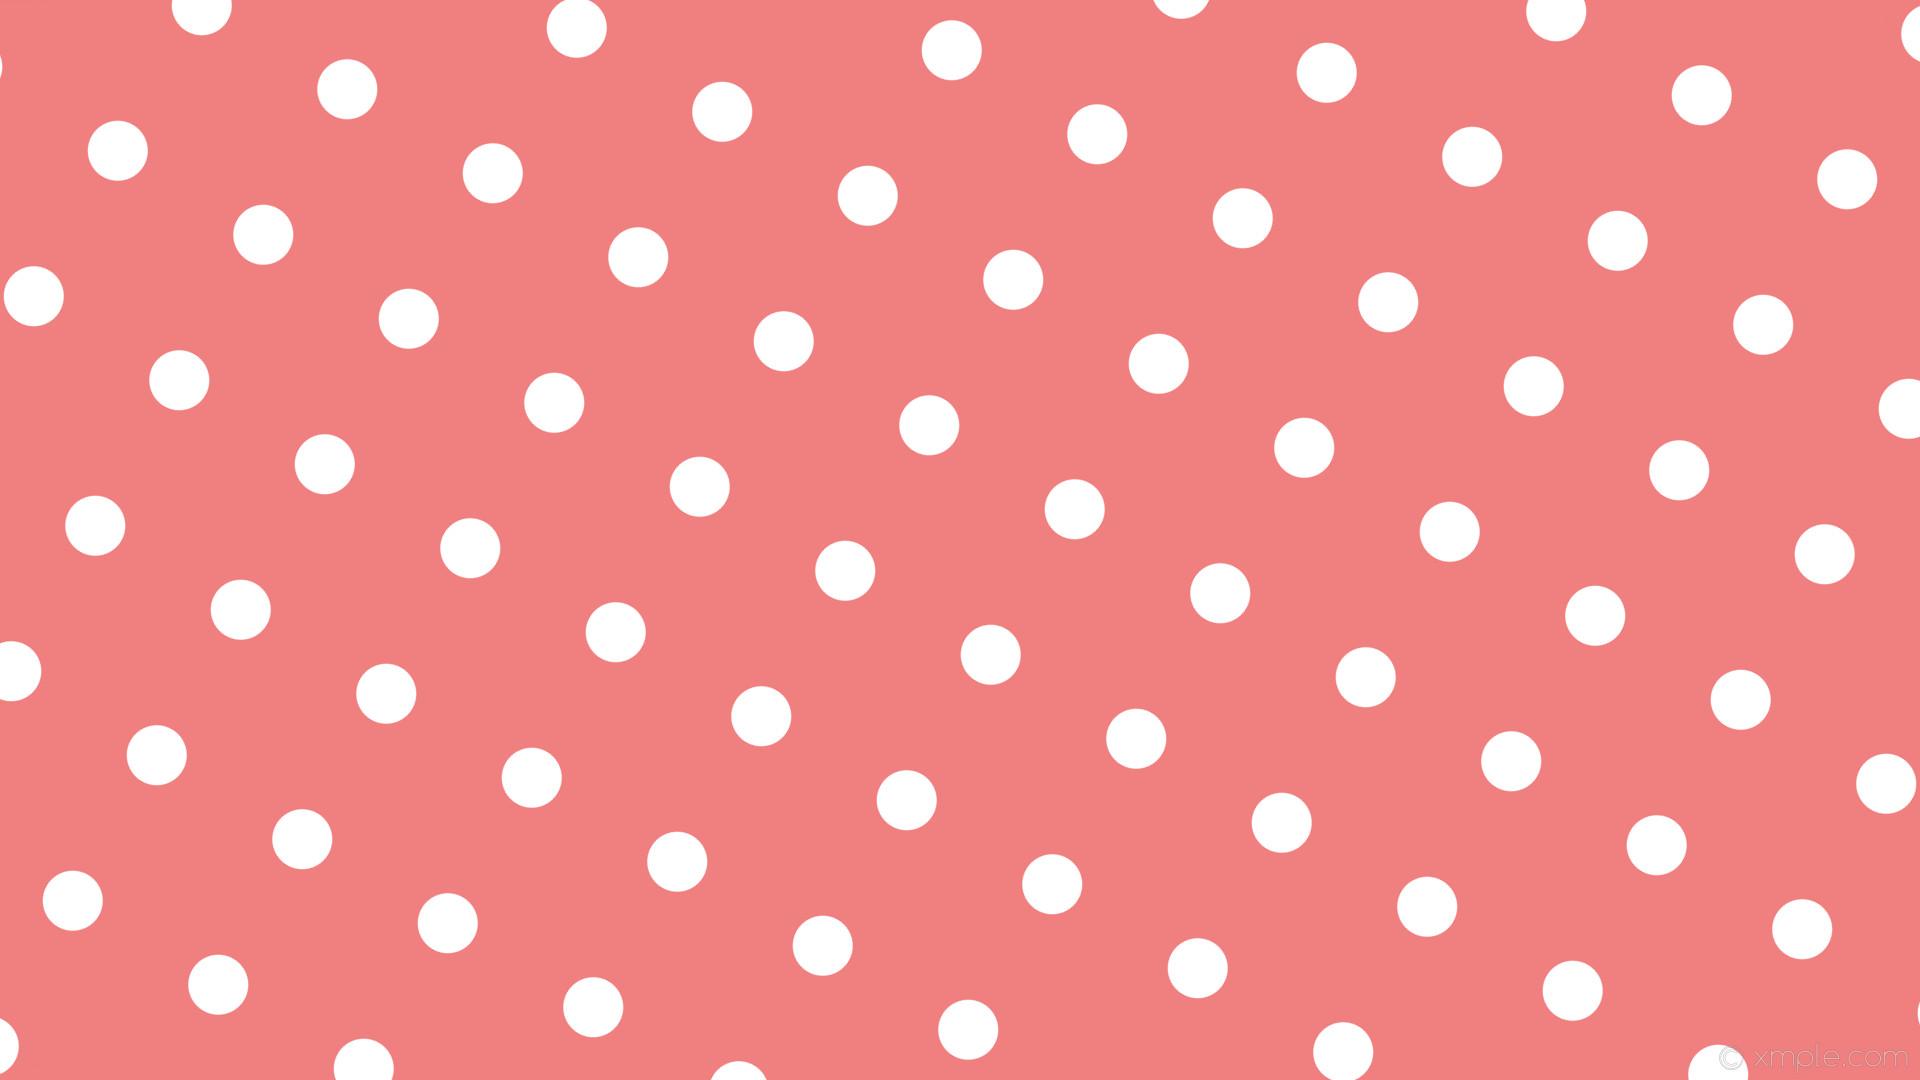 wallpaper white spots red polka dots light coral #f08080 #ffffff 150° 60px  168px